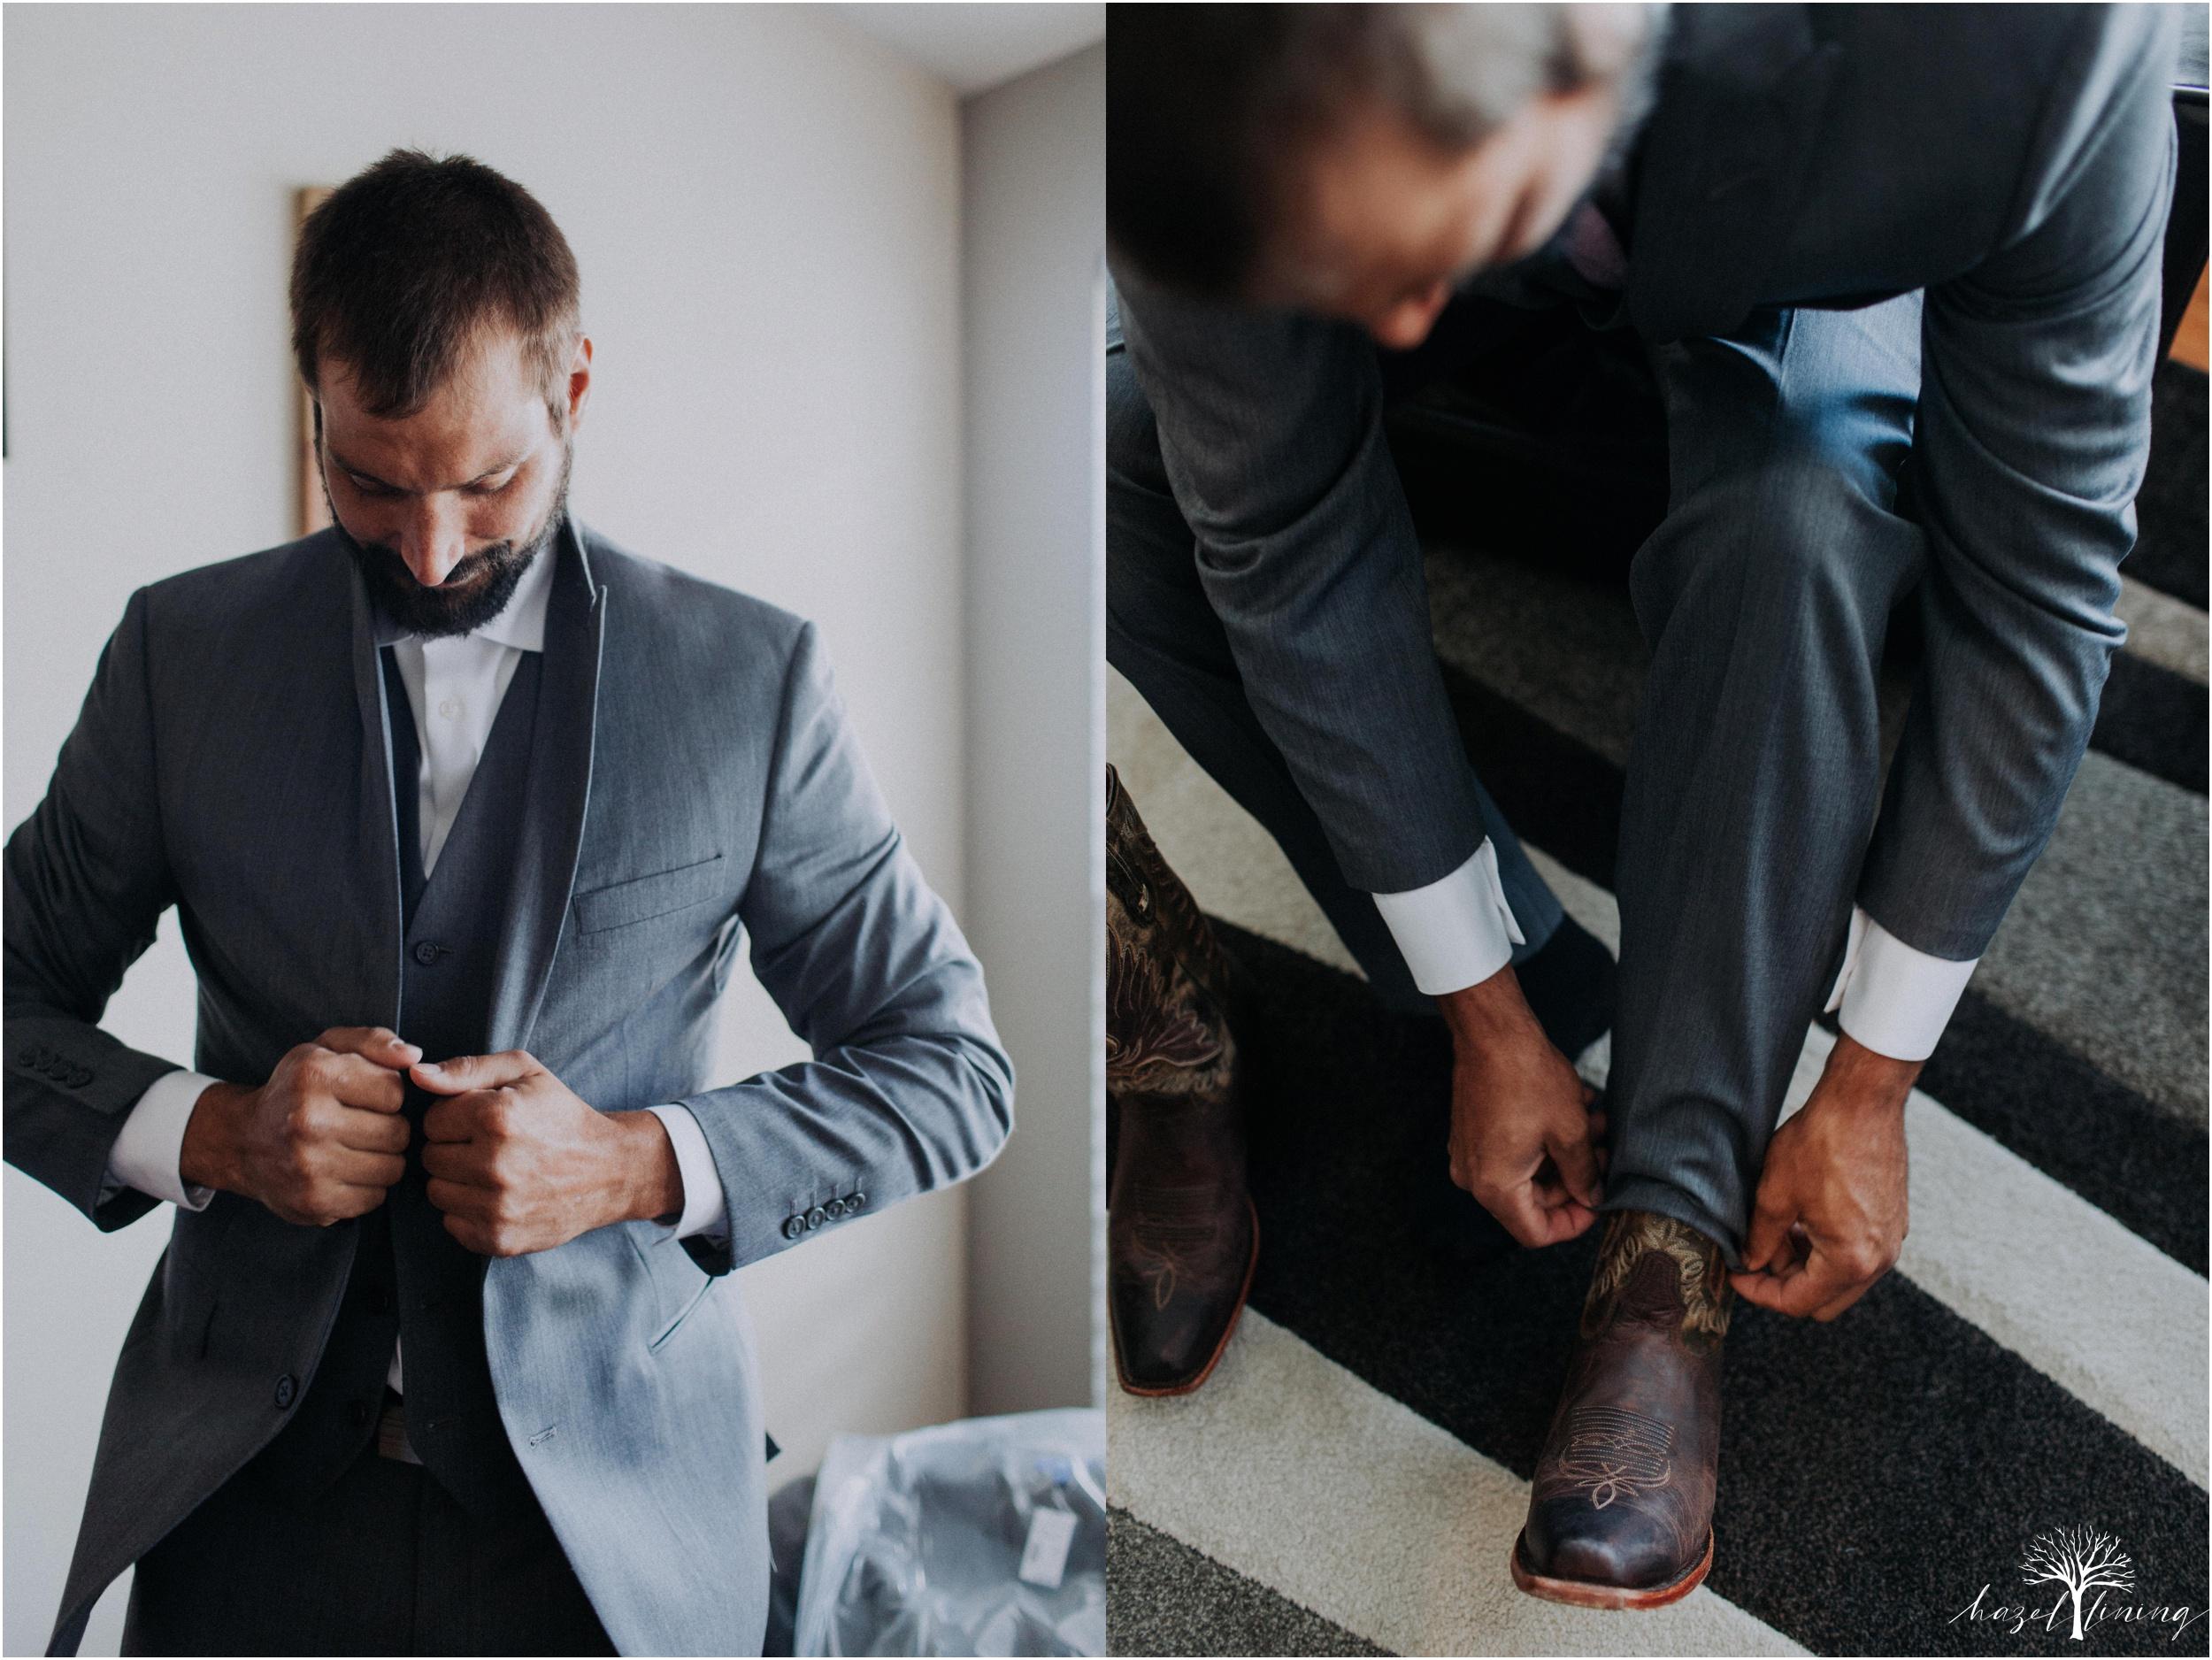 hazel-lining-travel-wedding-elopement-photography-lisa-landon-shoemaker-the-farm-bakery-and-events-bucks-county-quakertown-pennsylvania-summer-country-outdoor-farm-wedding_0039.jpg